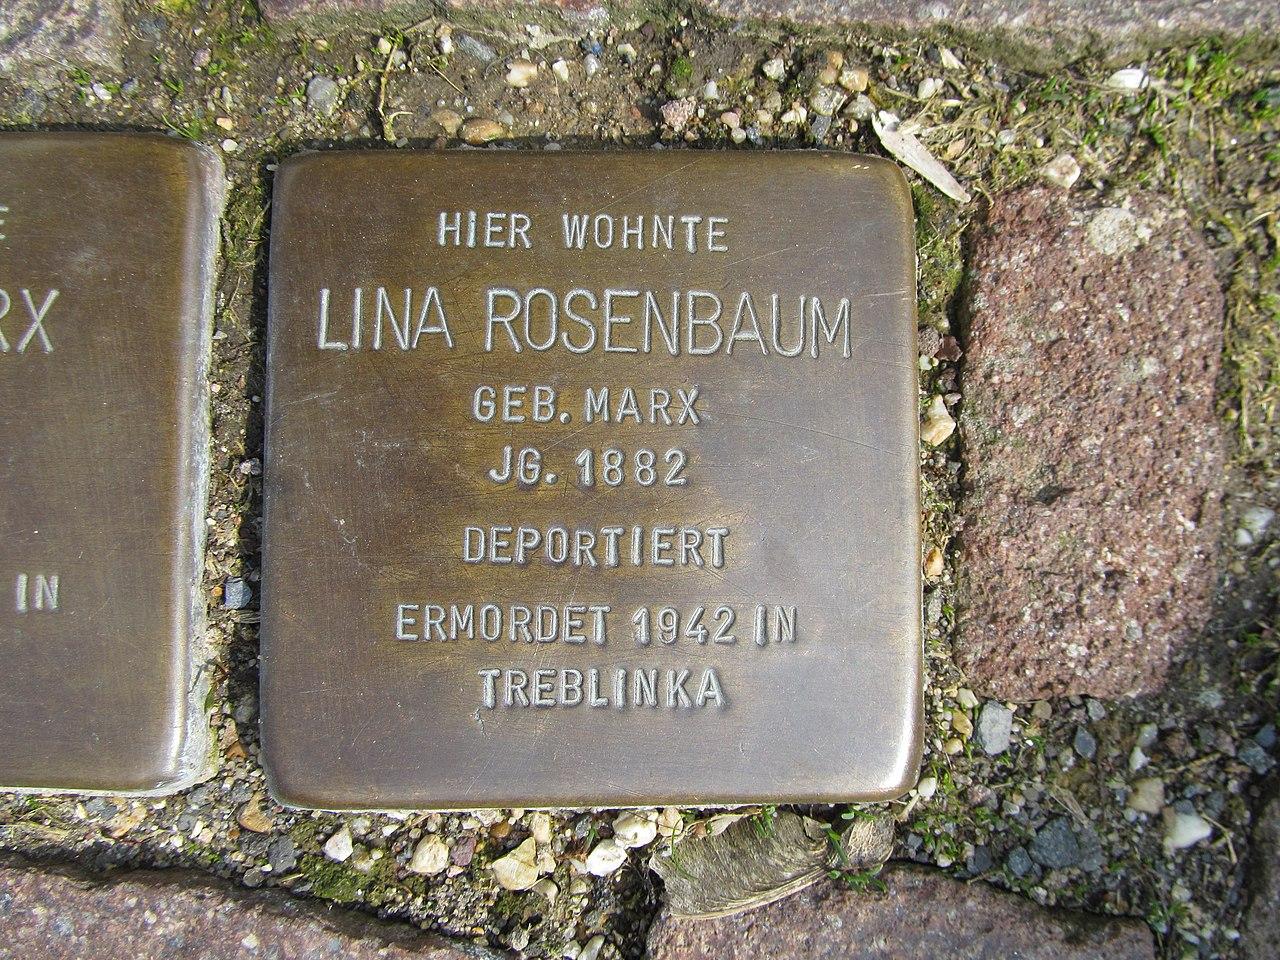 Stolperstein Lina Rosenbaum, 1, Pferdemarkt 8, Frankenberg, Landkreis Waldeck-Frankenberg.jpg